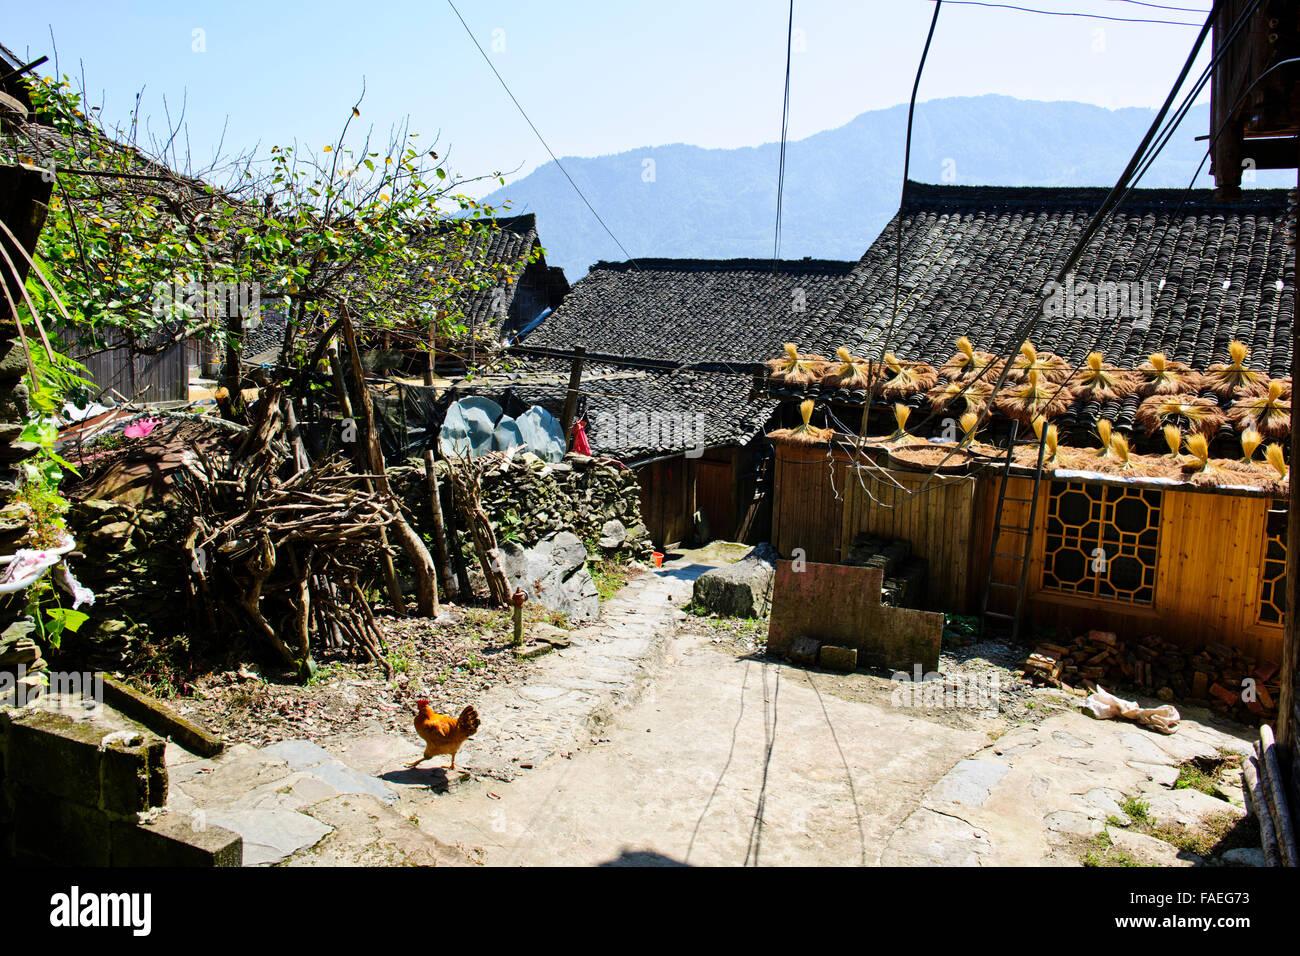 Longji Rice Terraces,Dazhai Villages, Surrounding Area,Rice Crops,Zhuang and Yao Villages,Longsheng,Guangxi Province,PRC,People' Stock Photo